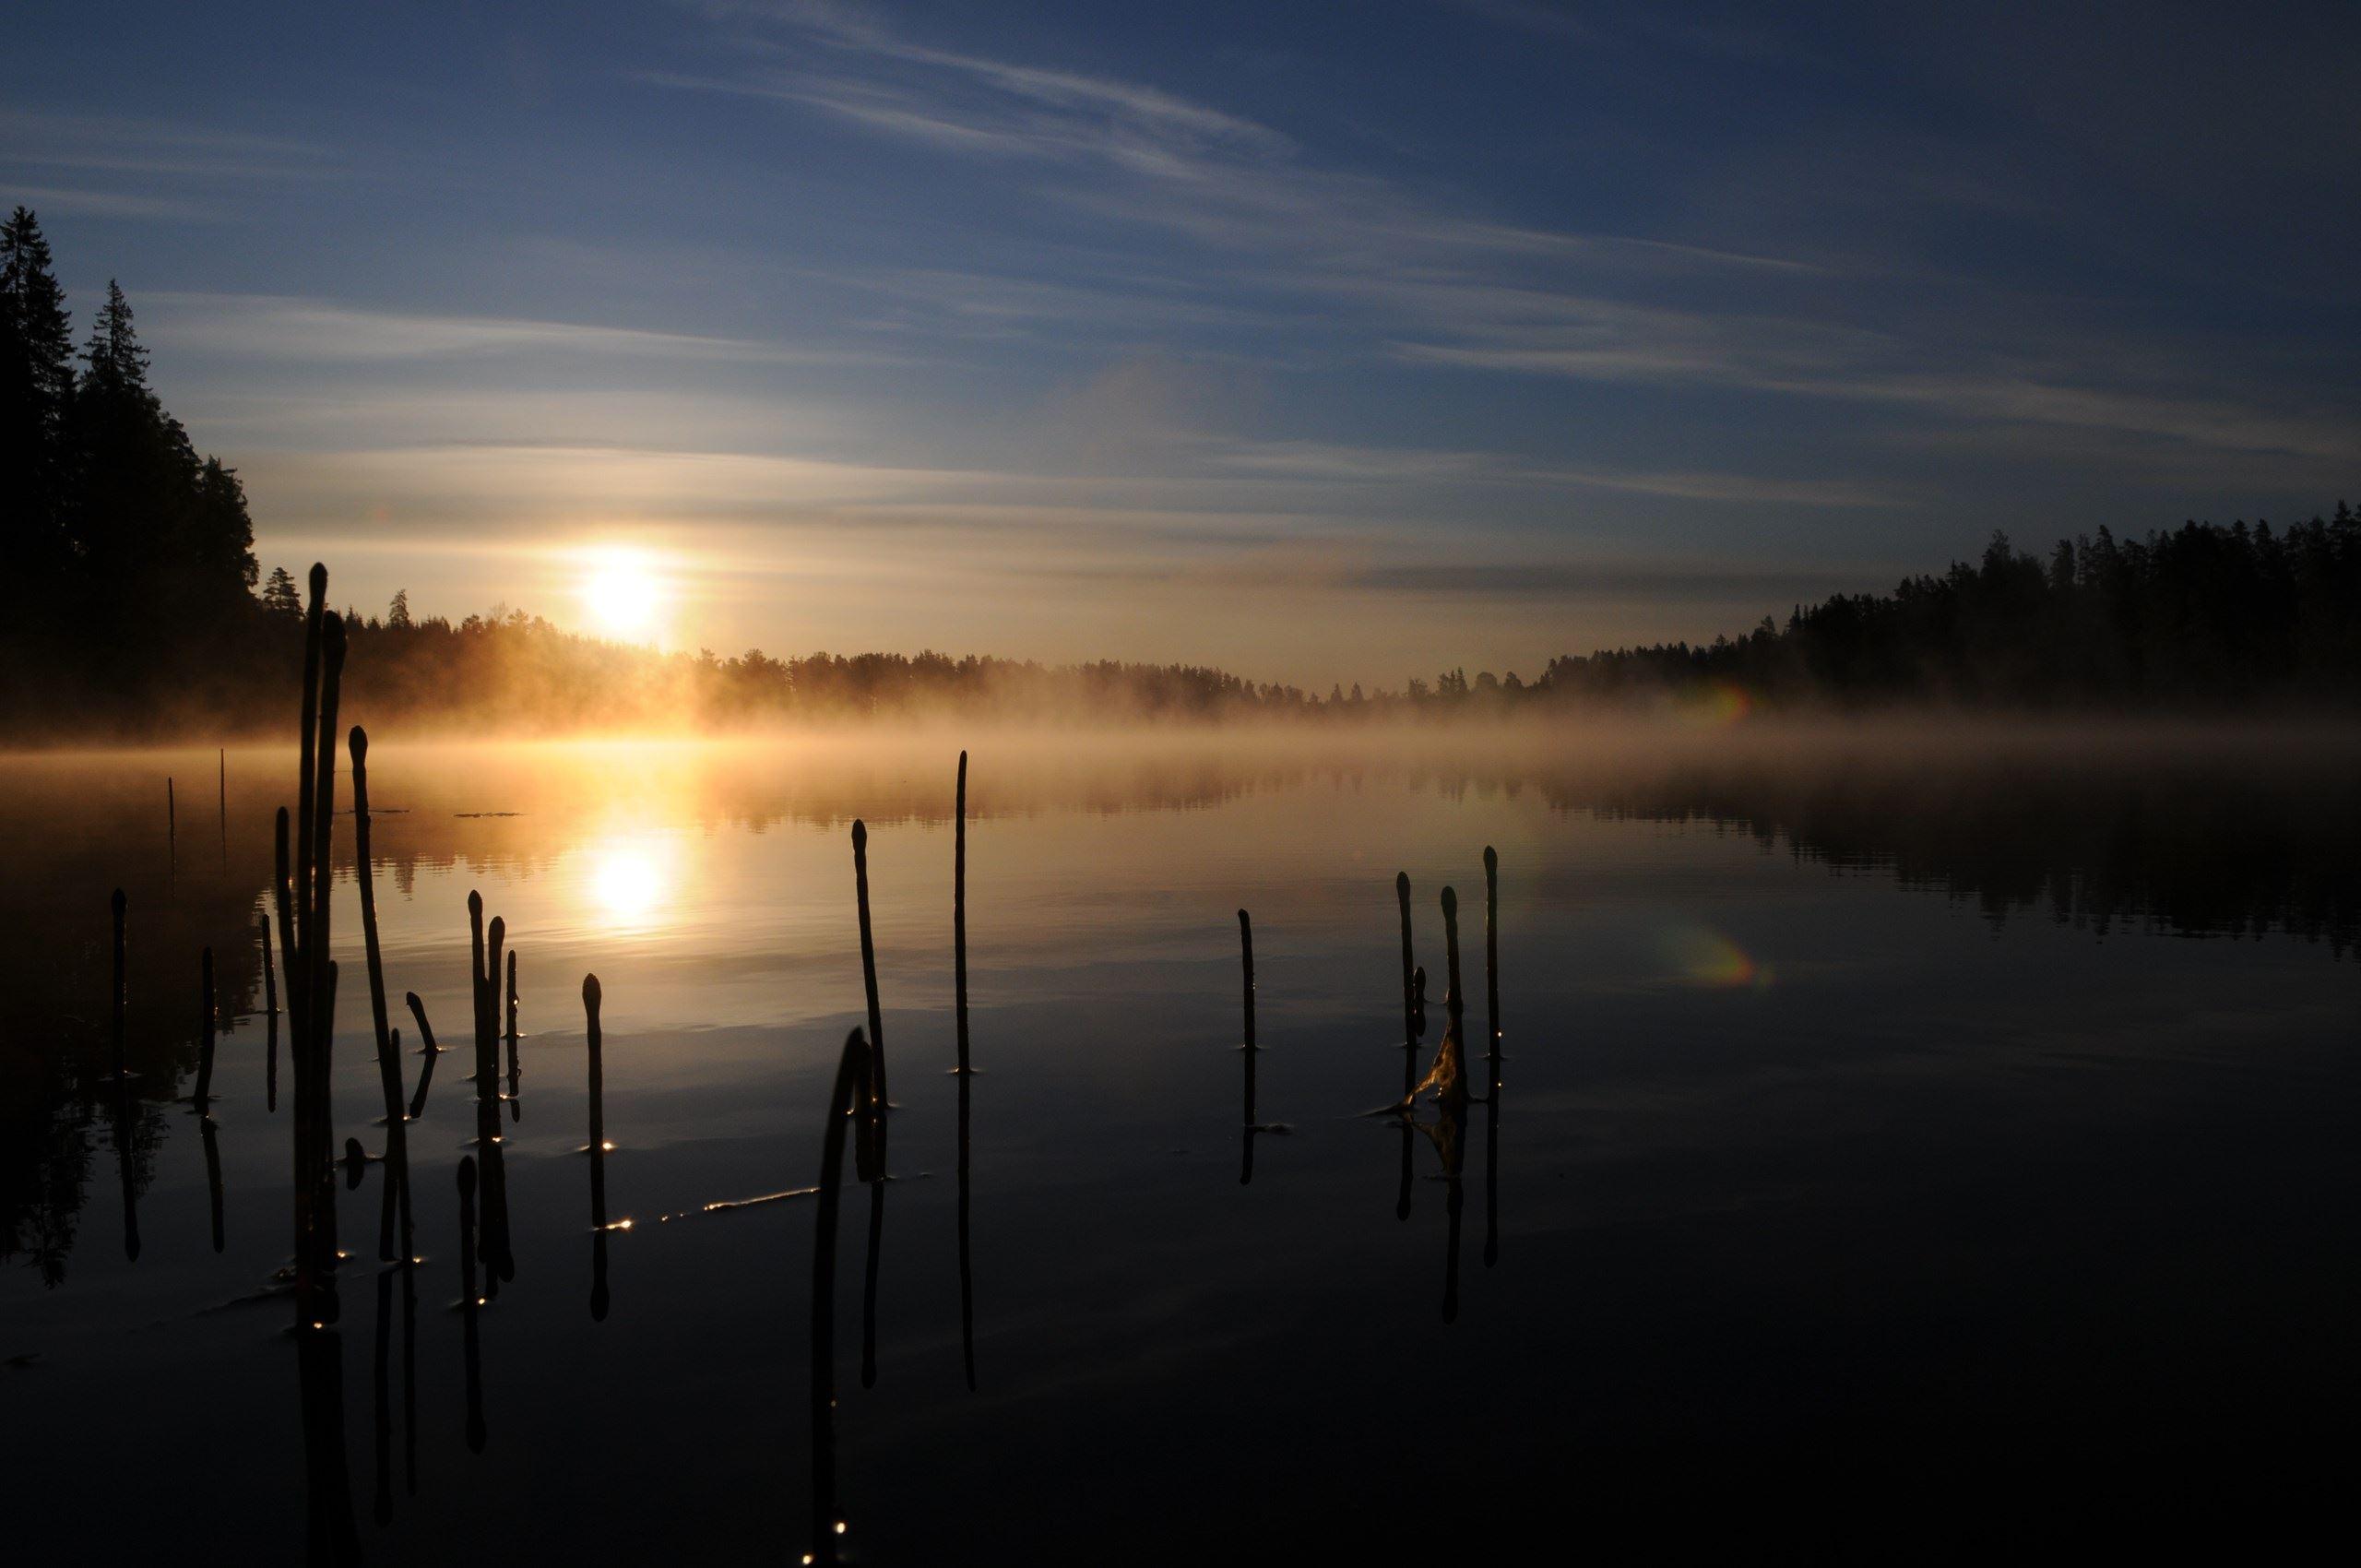 Fiskekort Strängseredsjön